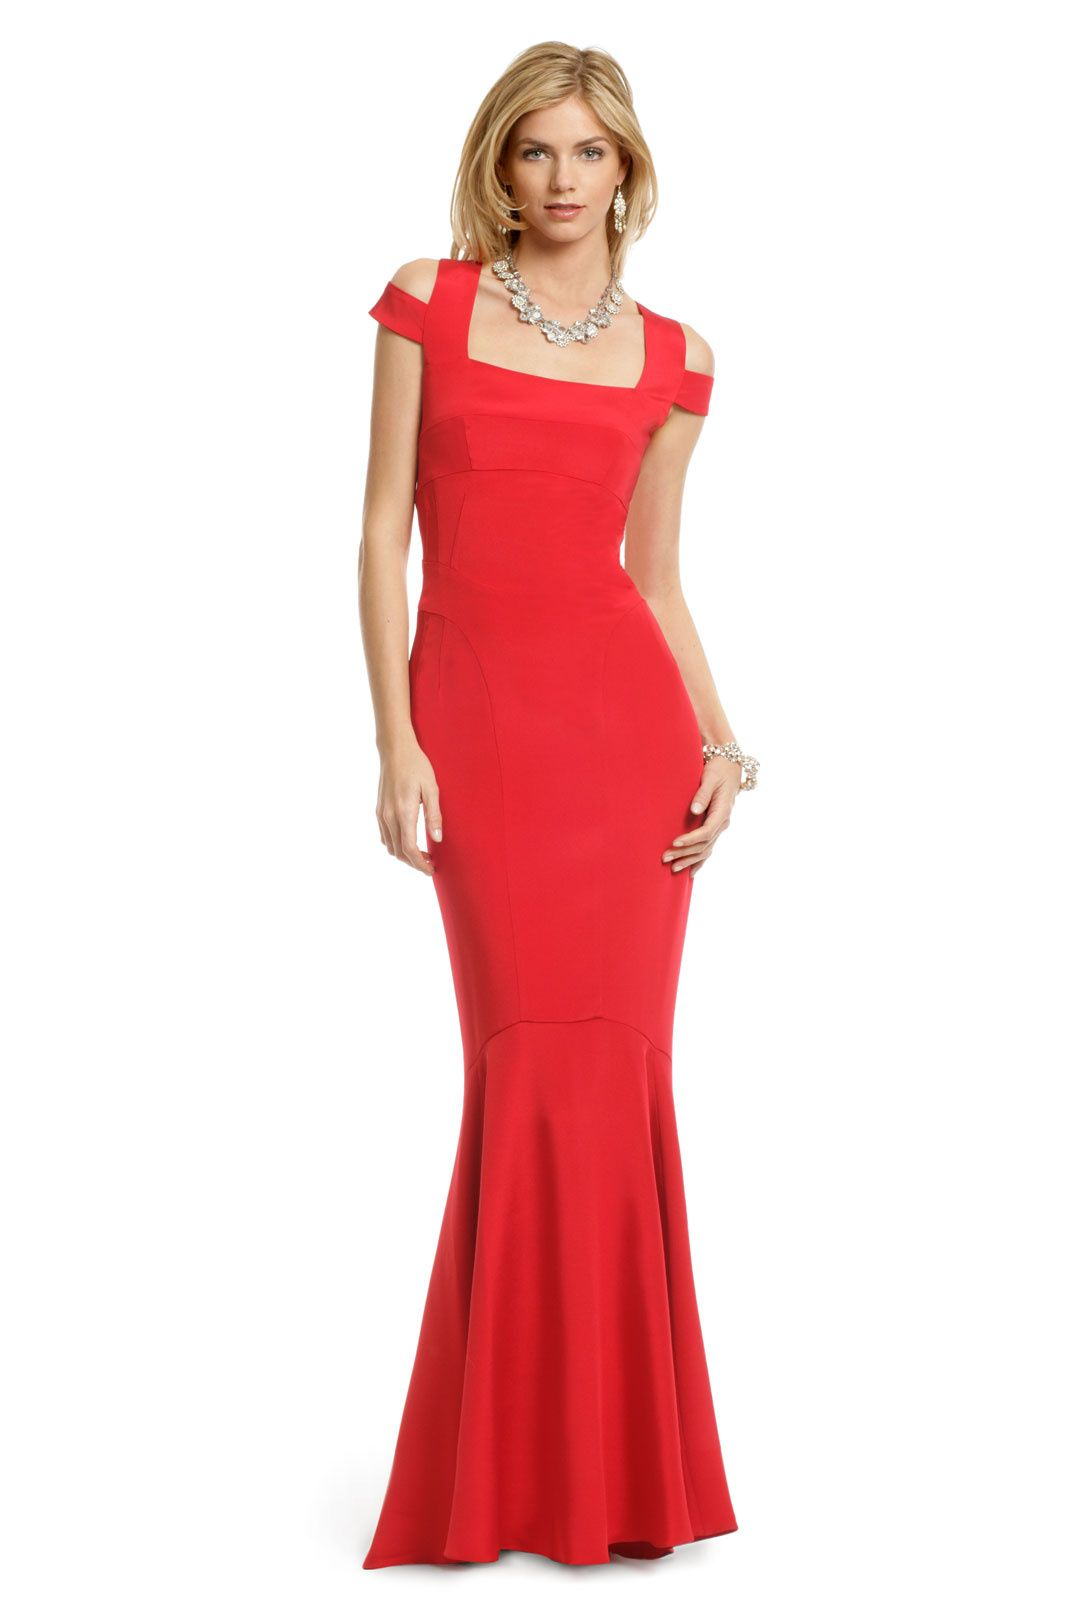 Crimson Cutout Gown Pw Dresses Gowns Prom Dresses